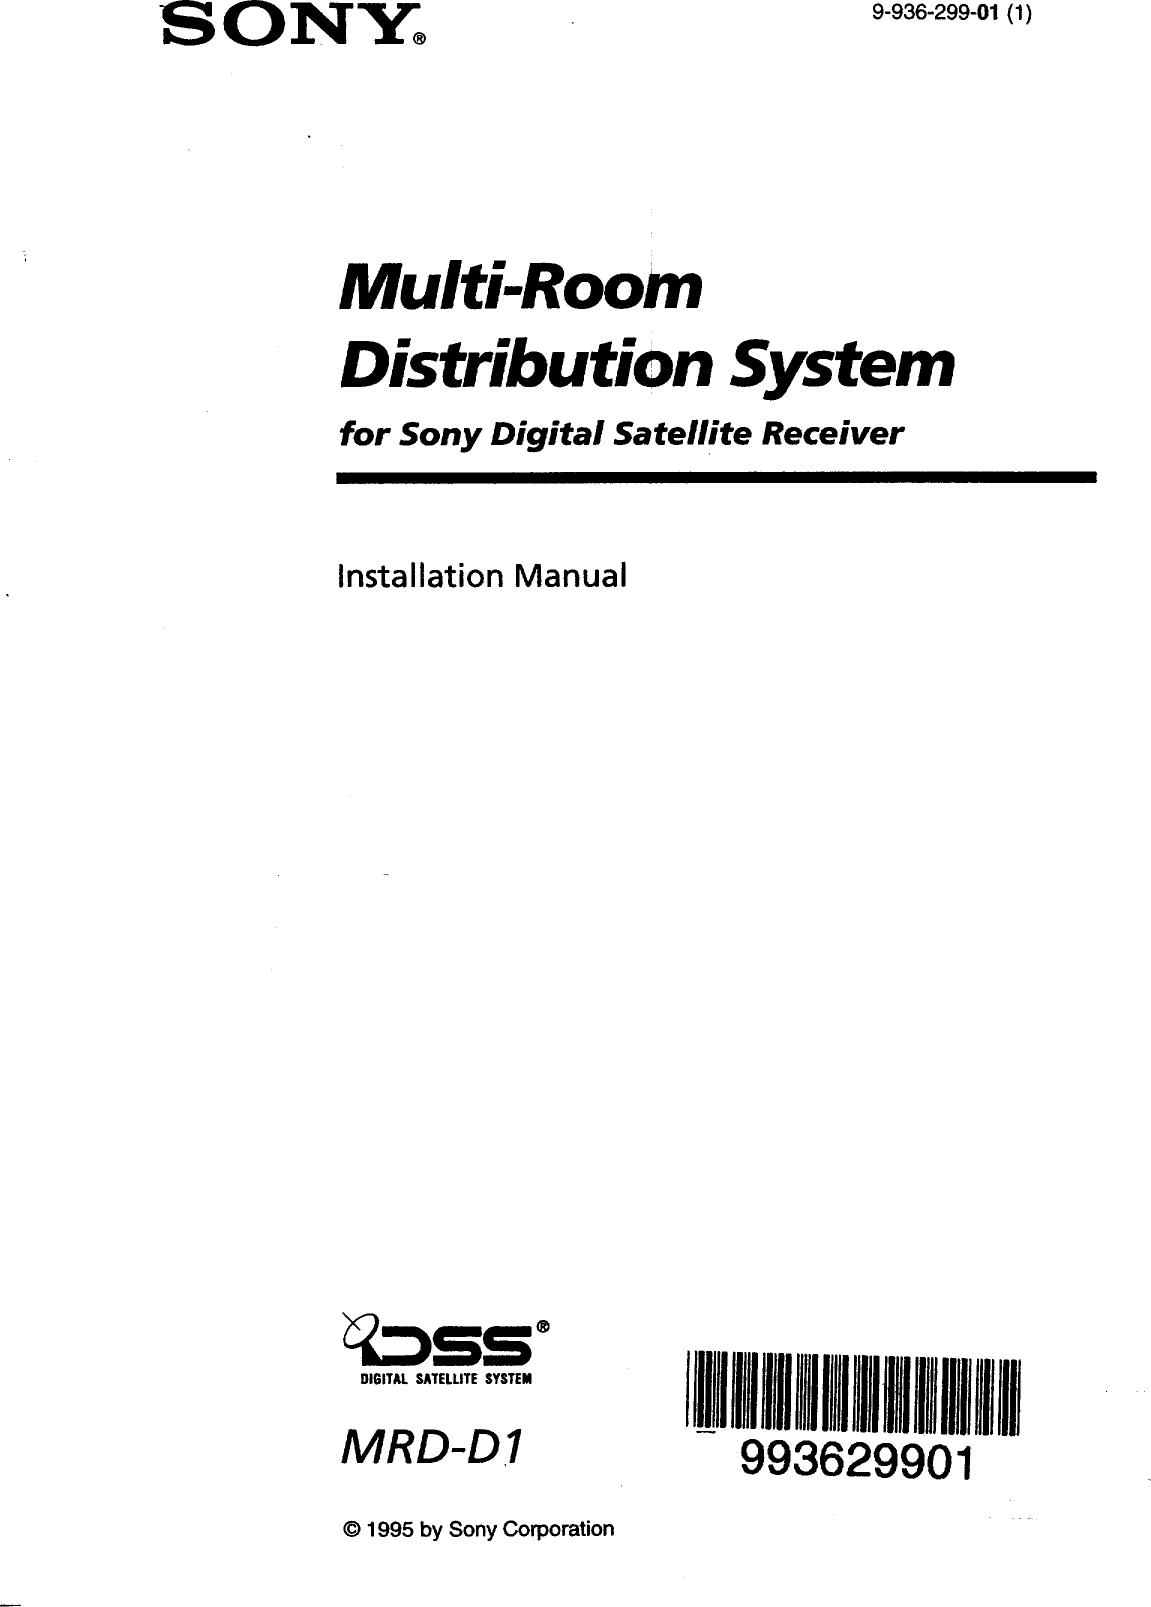 SONY Digital Satellite System Manual 98060096